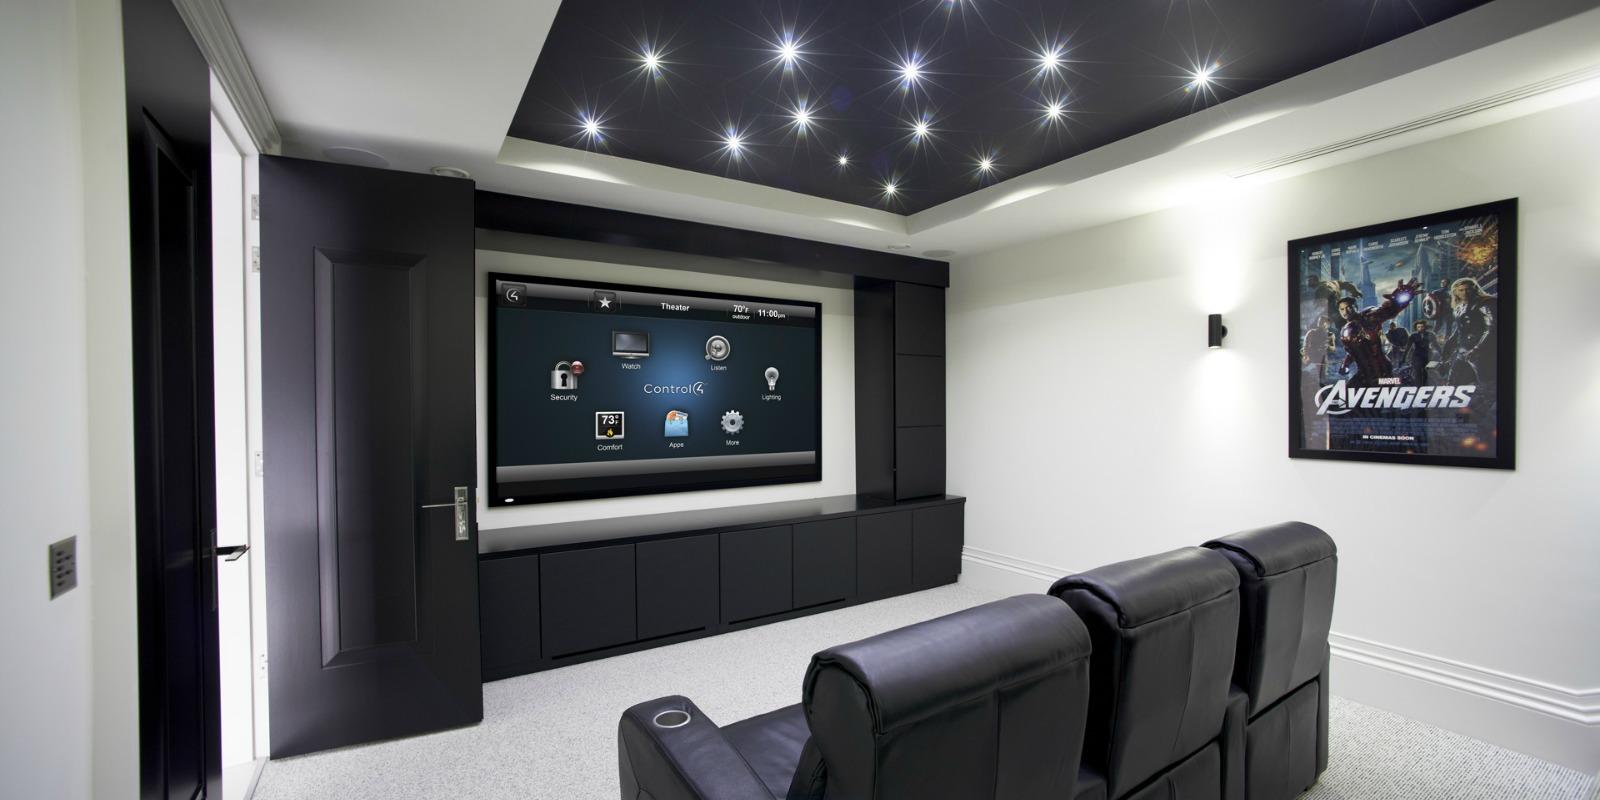 control4 entertainment system